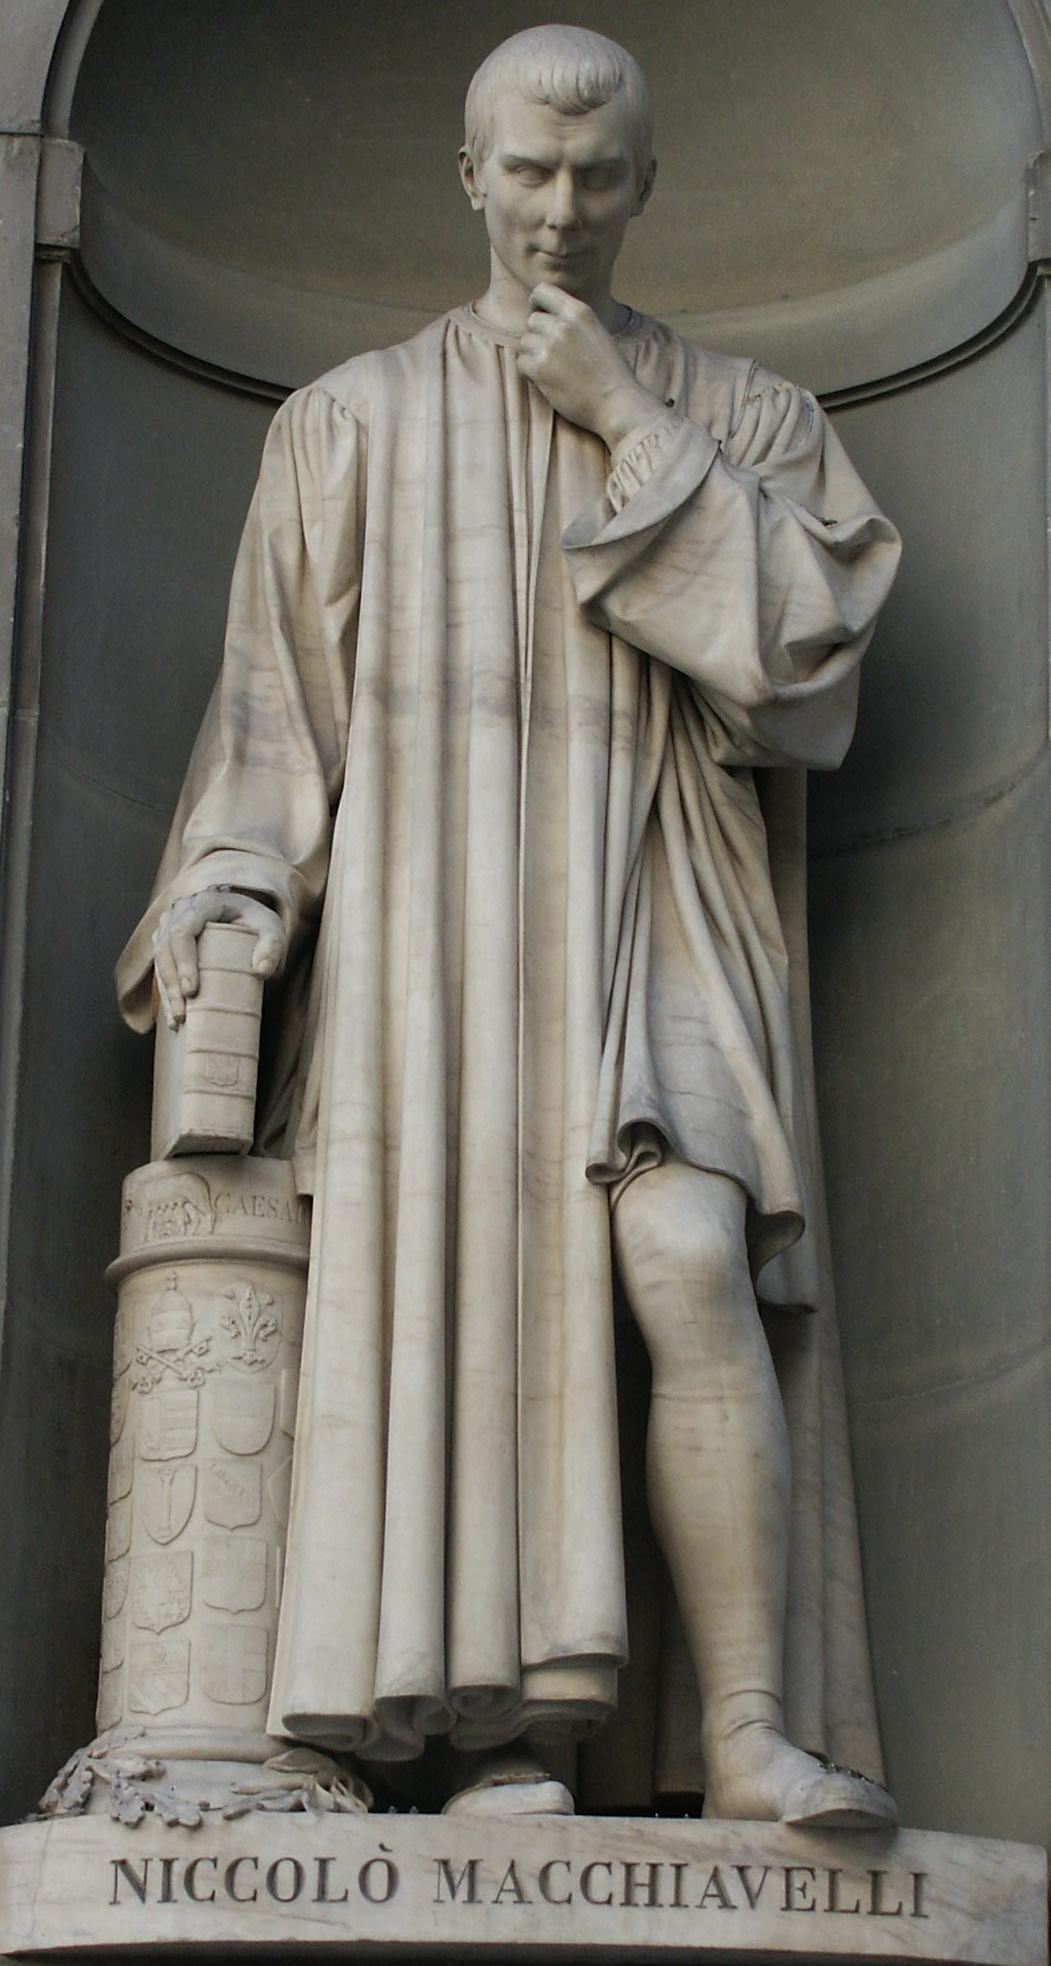 Sezione - Tara & simili > - Pagina 40 Niccolo_Machiavelli_uffizi